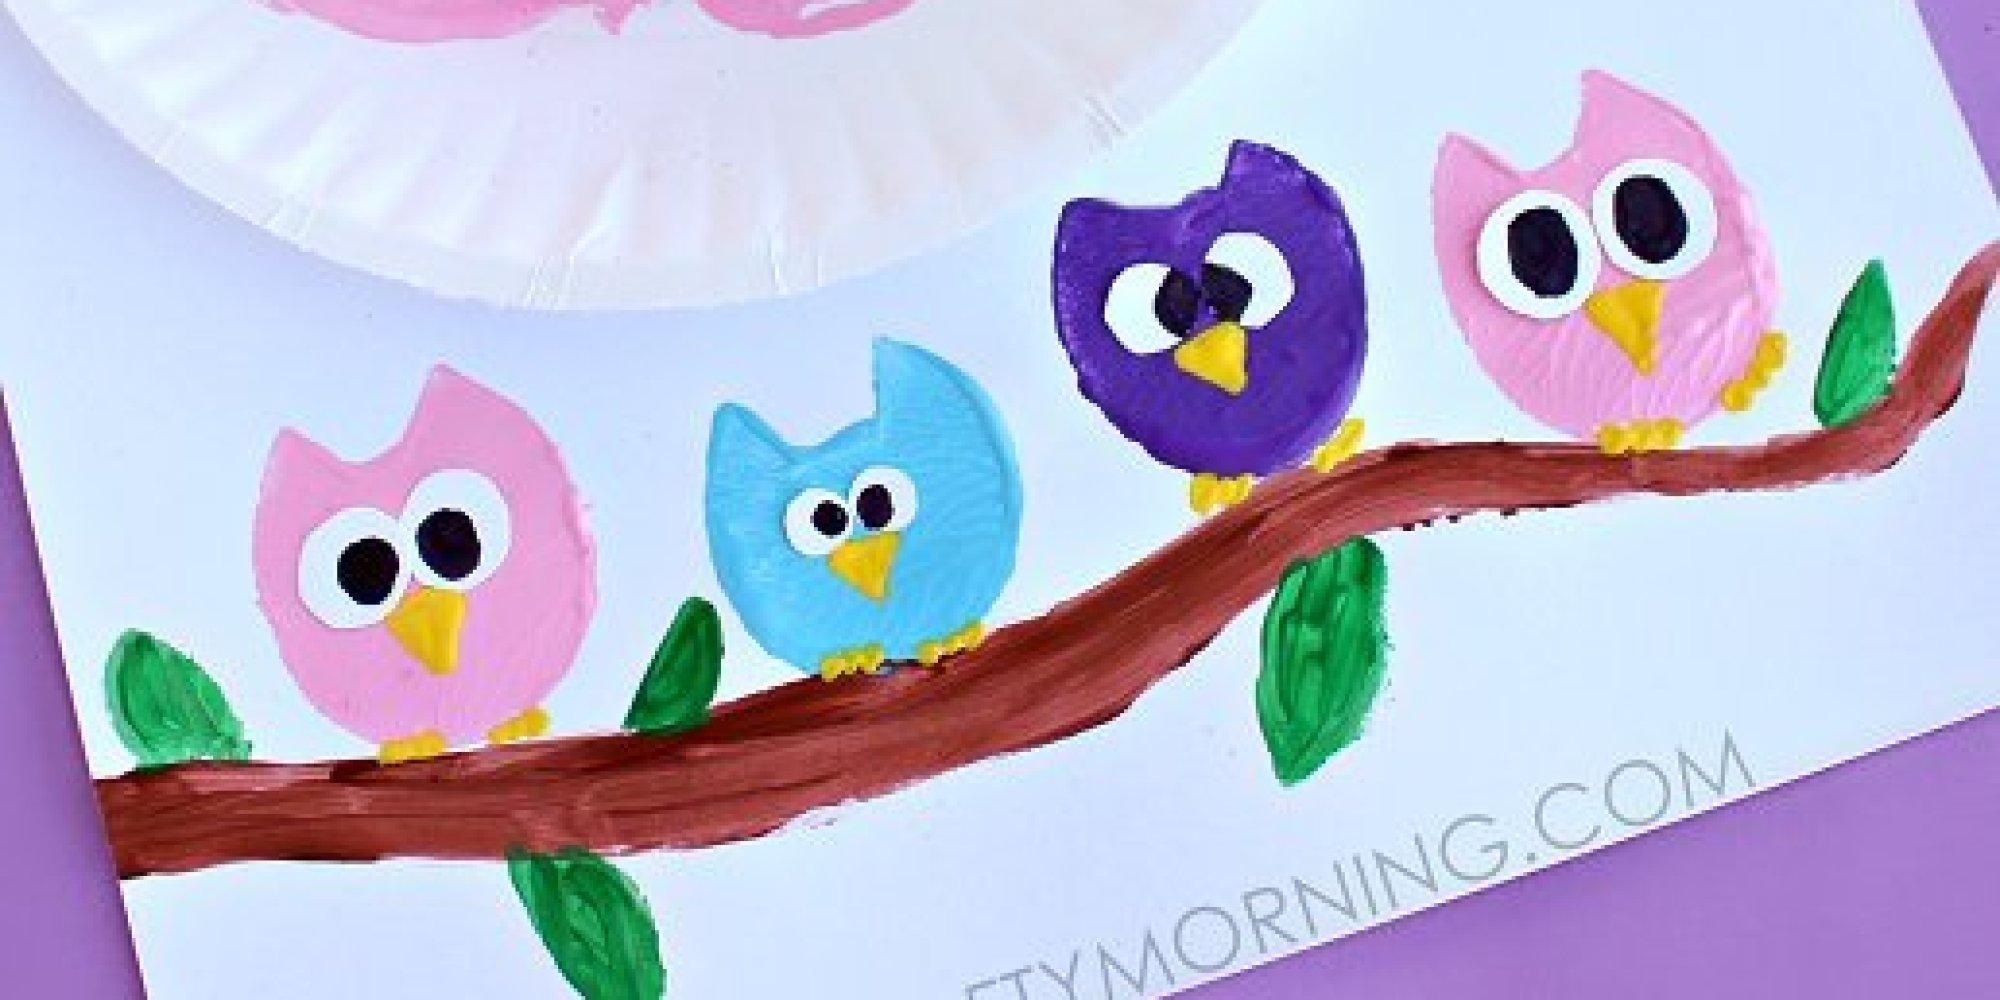 Kids Craft Ideas 11 Ways To Make Stamp Art With Potatoes